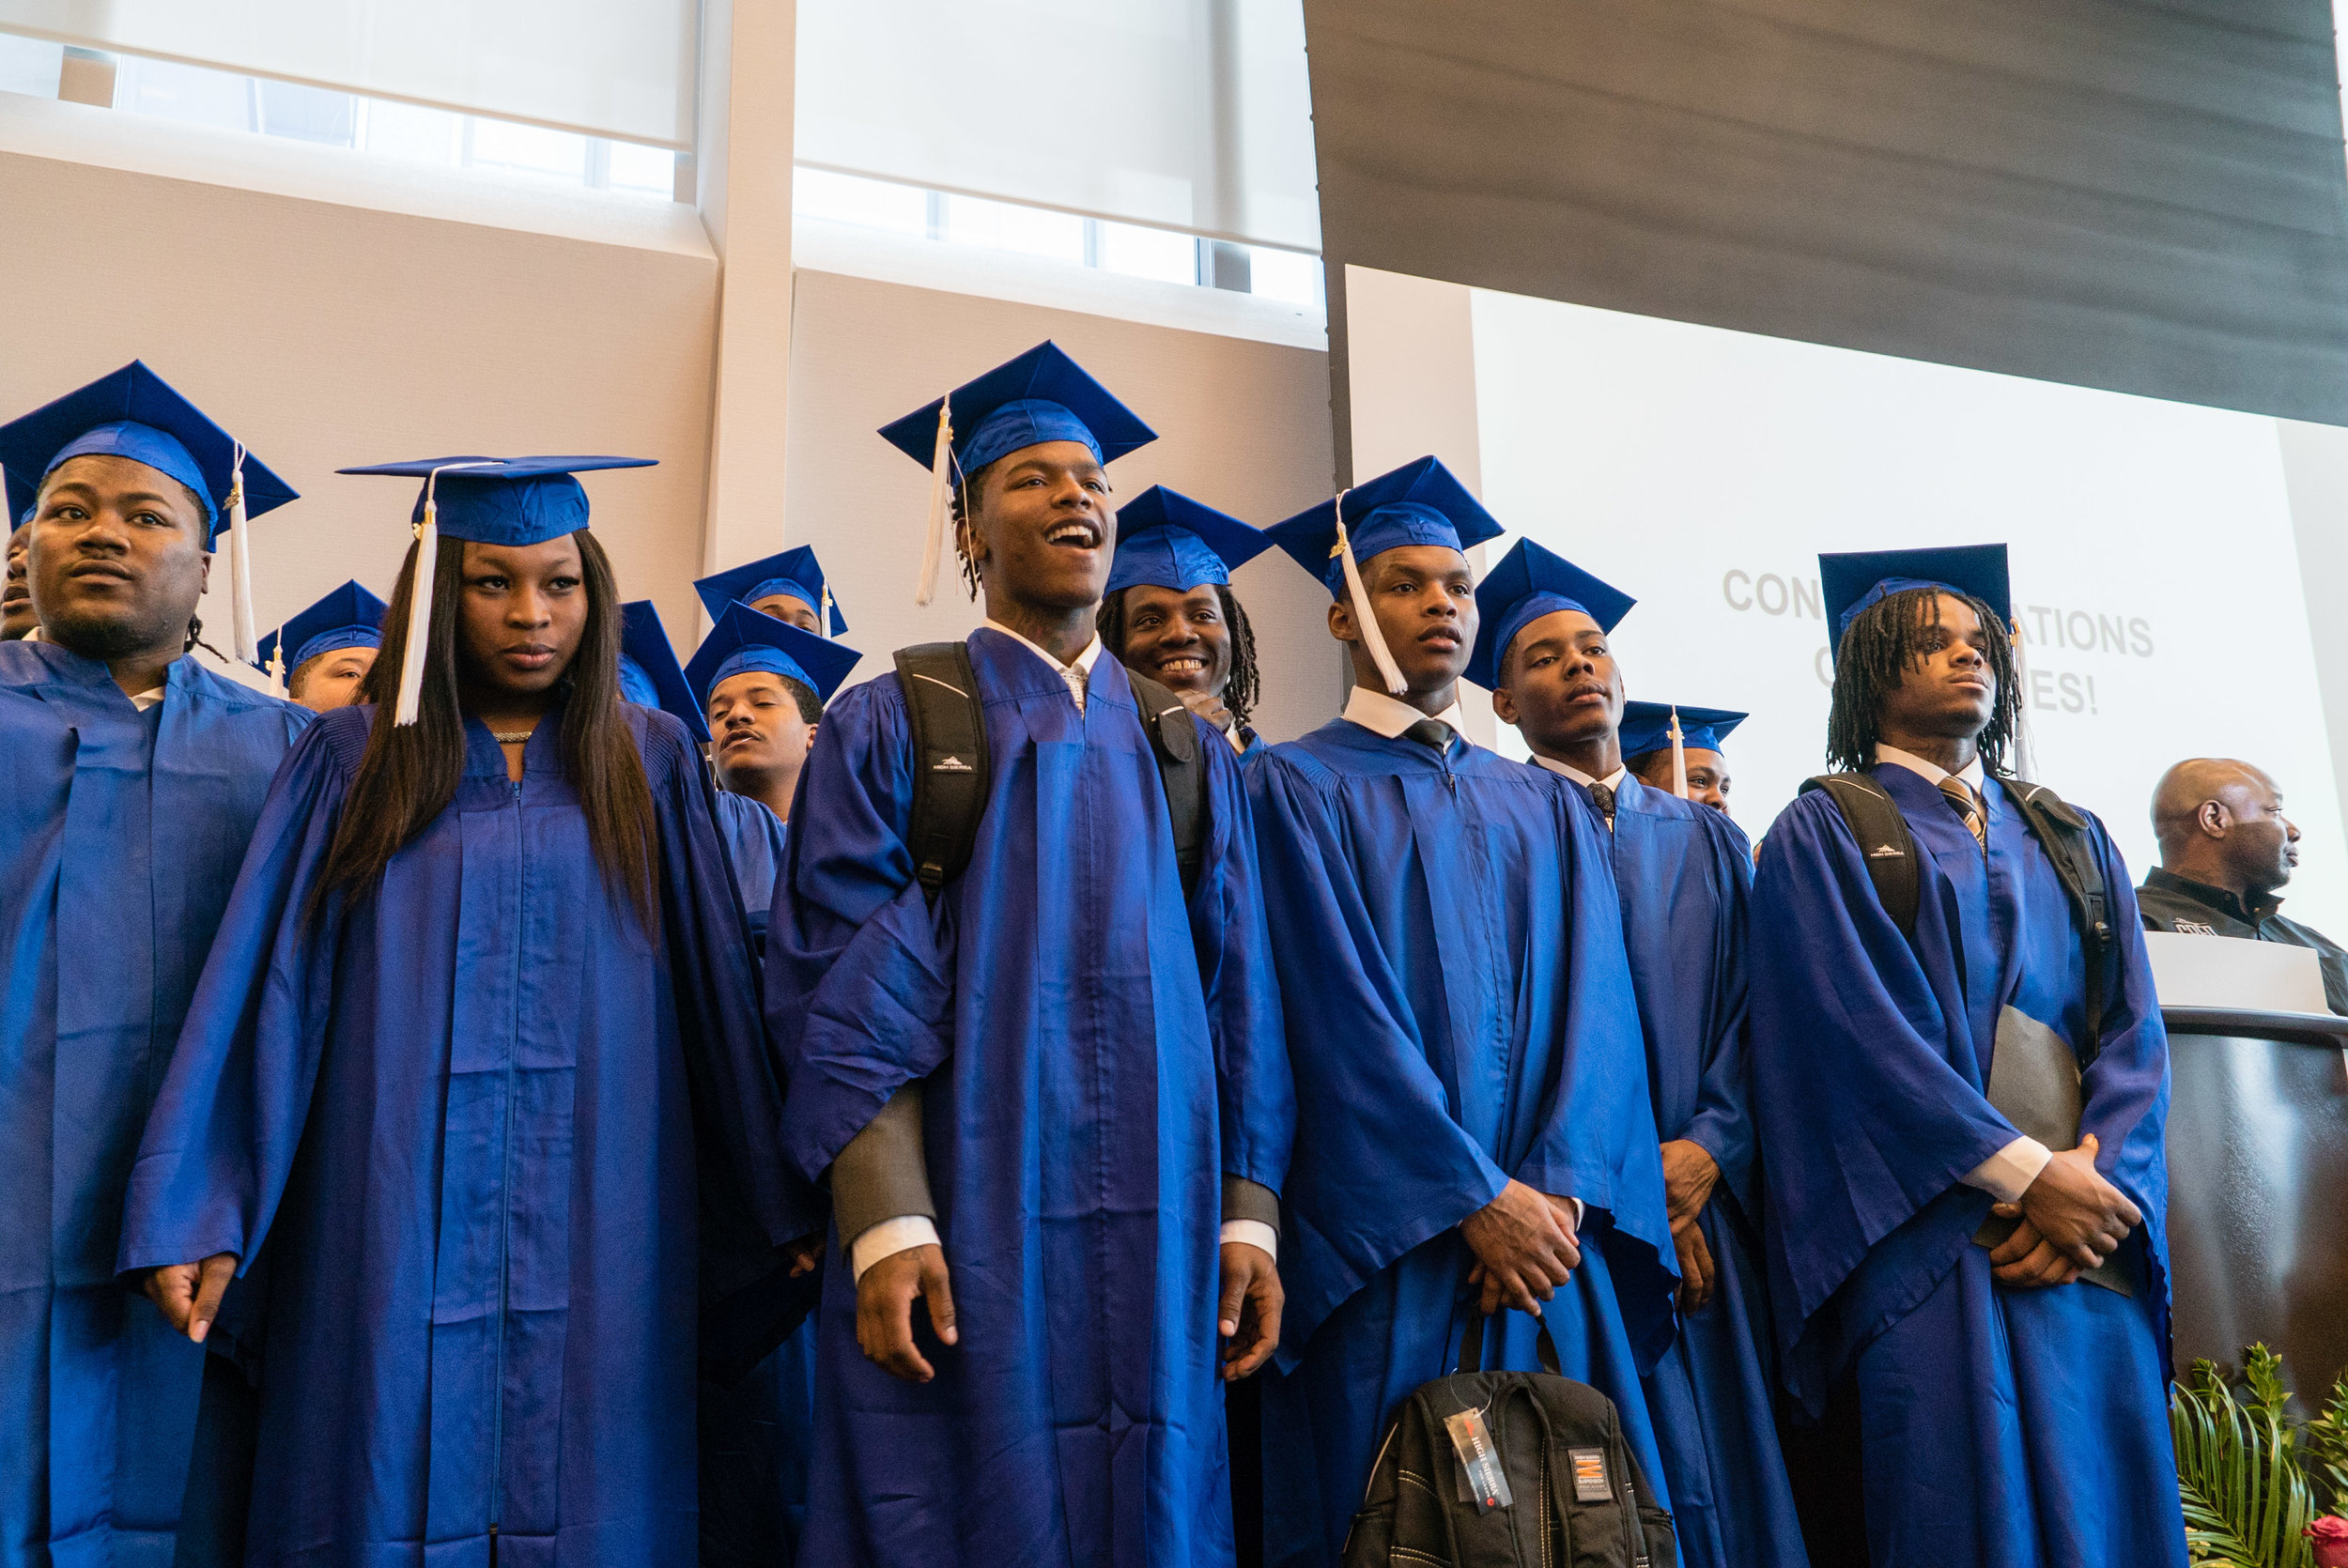 CRED_Graduation_Chicago_04062018-17.jpg